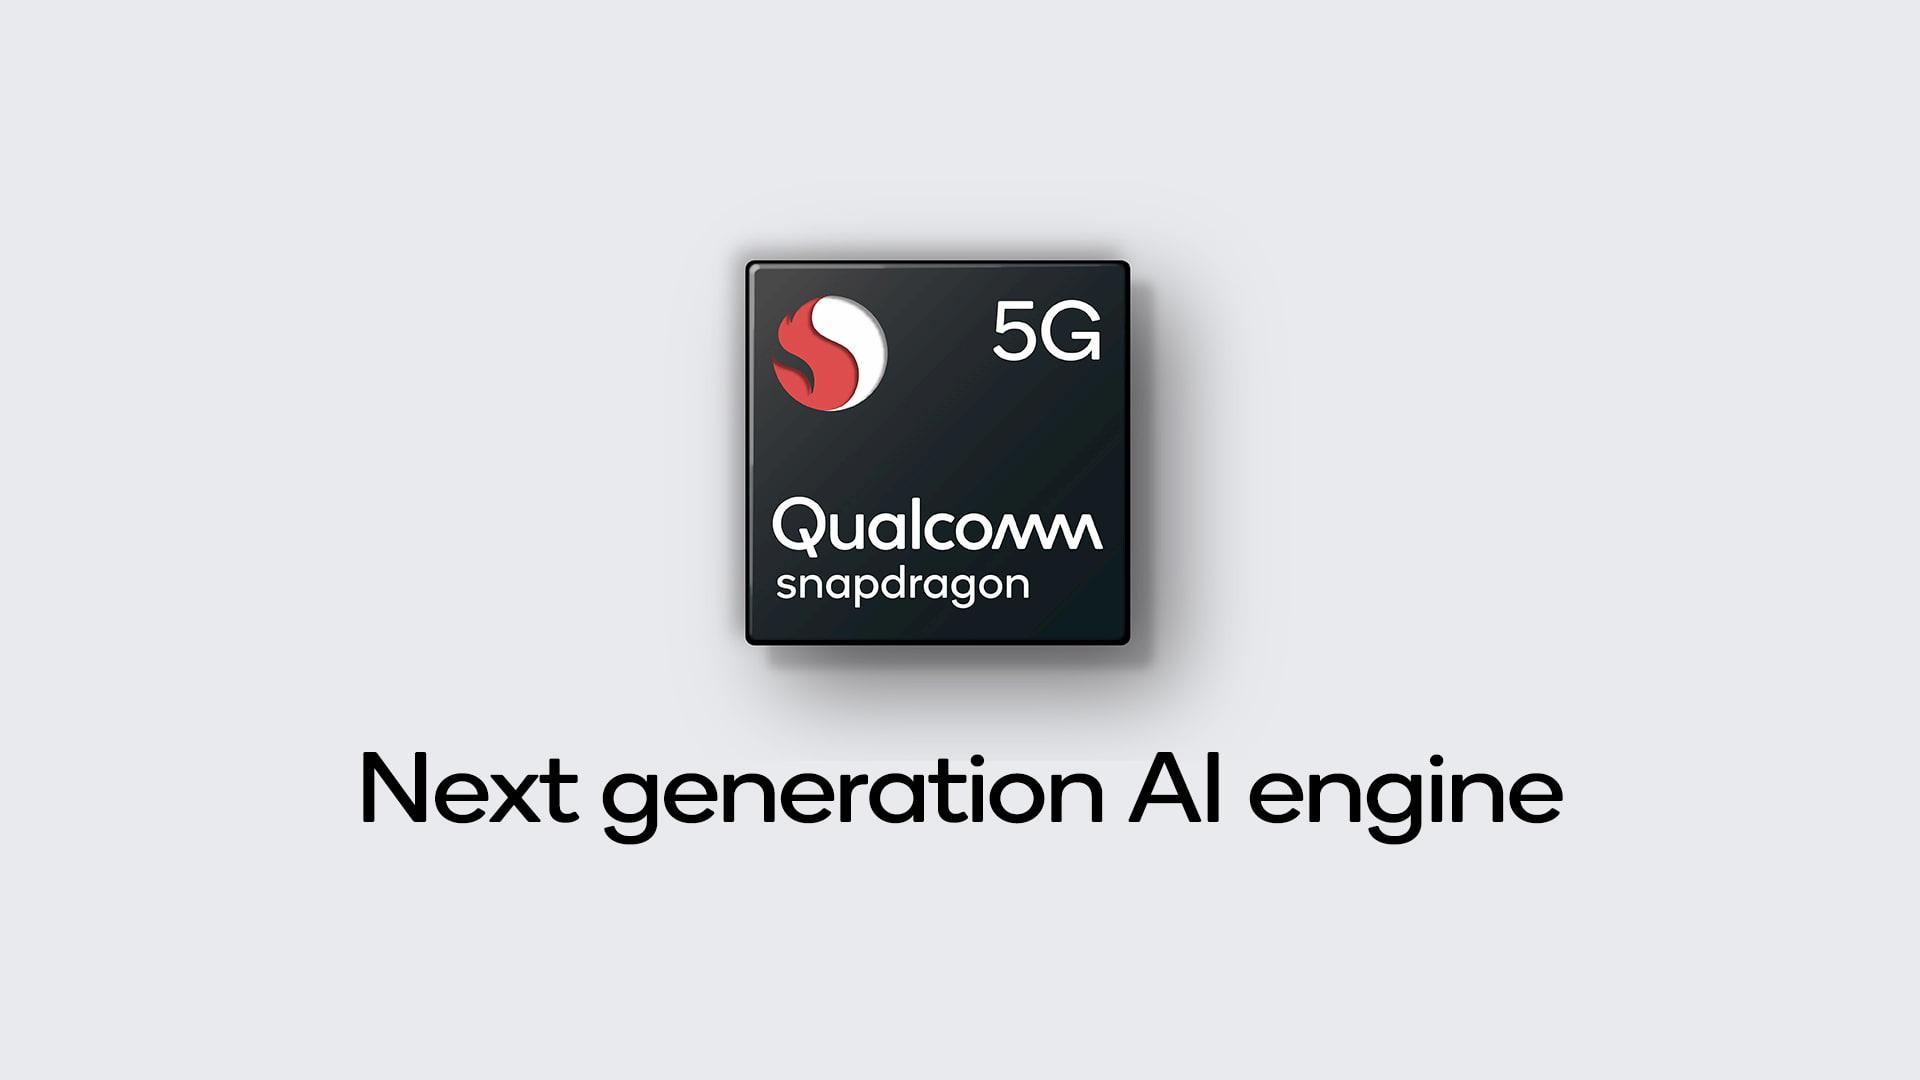 Qualcomm expands its 5G strategy at IFA 2019 - SlashGear